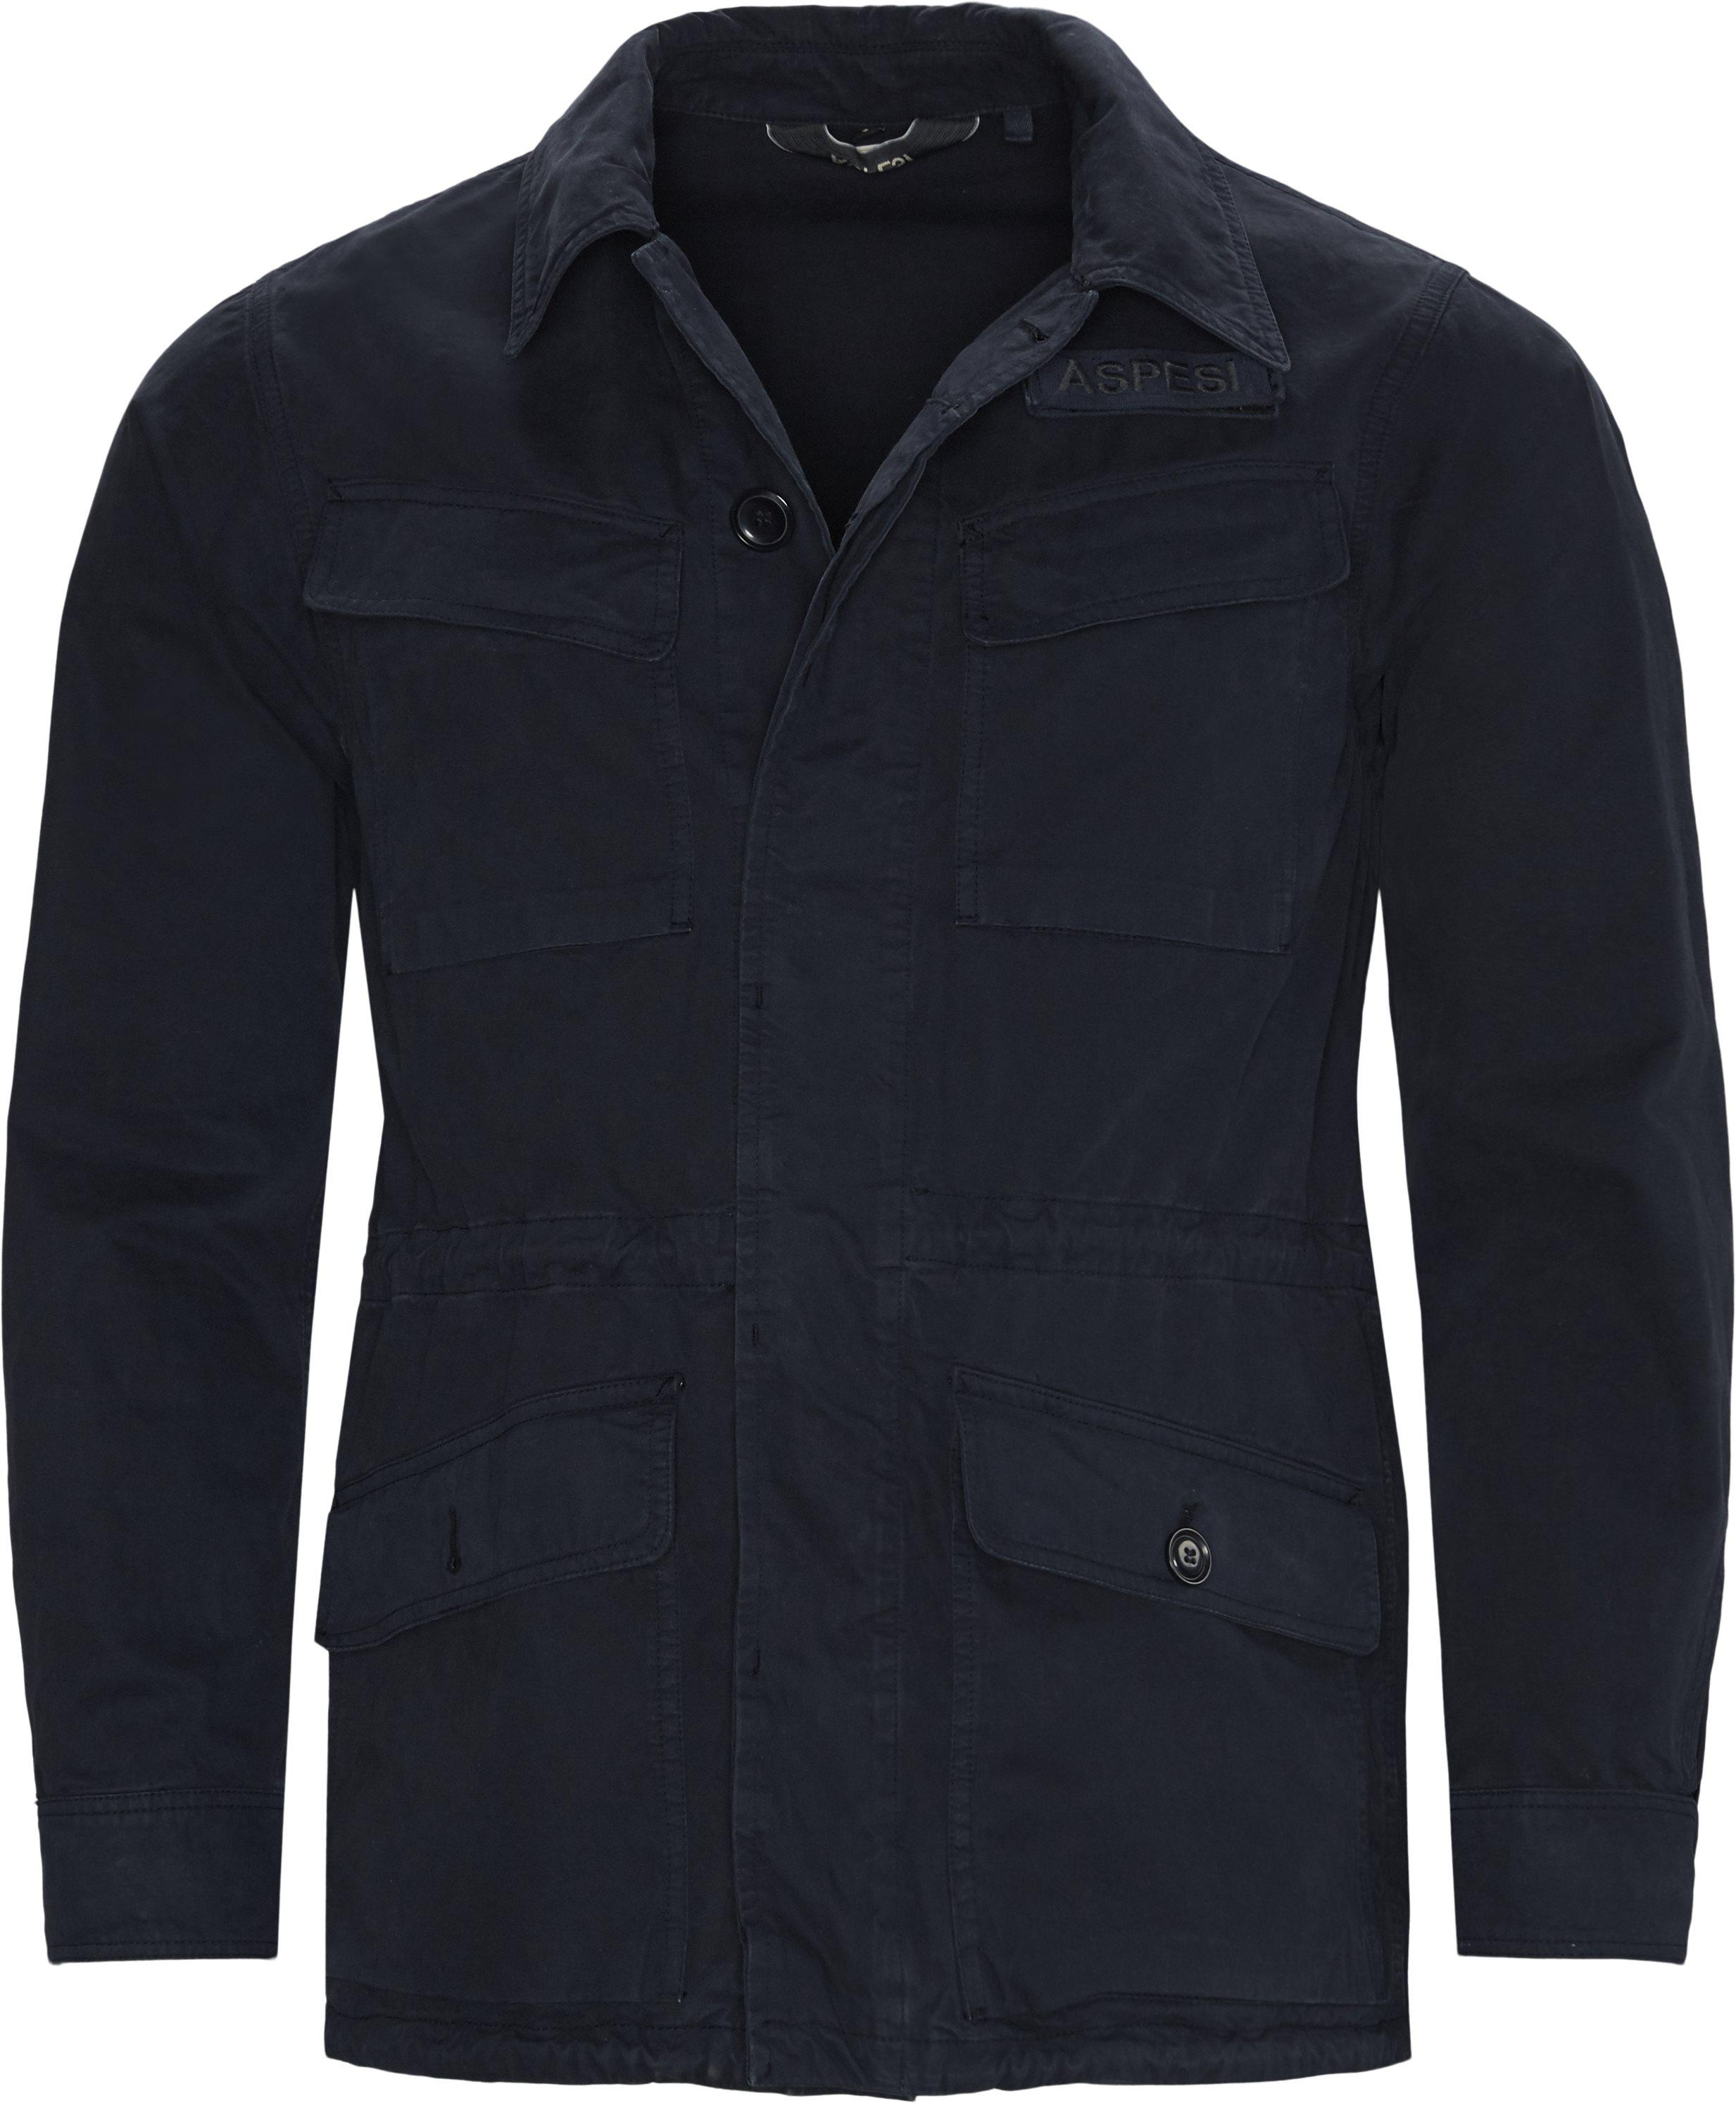 Jakker - Regular fit - Blå